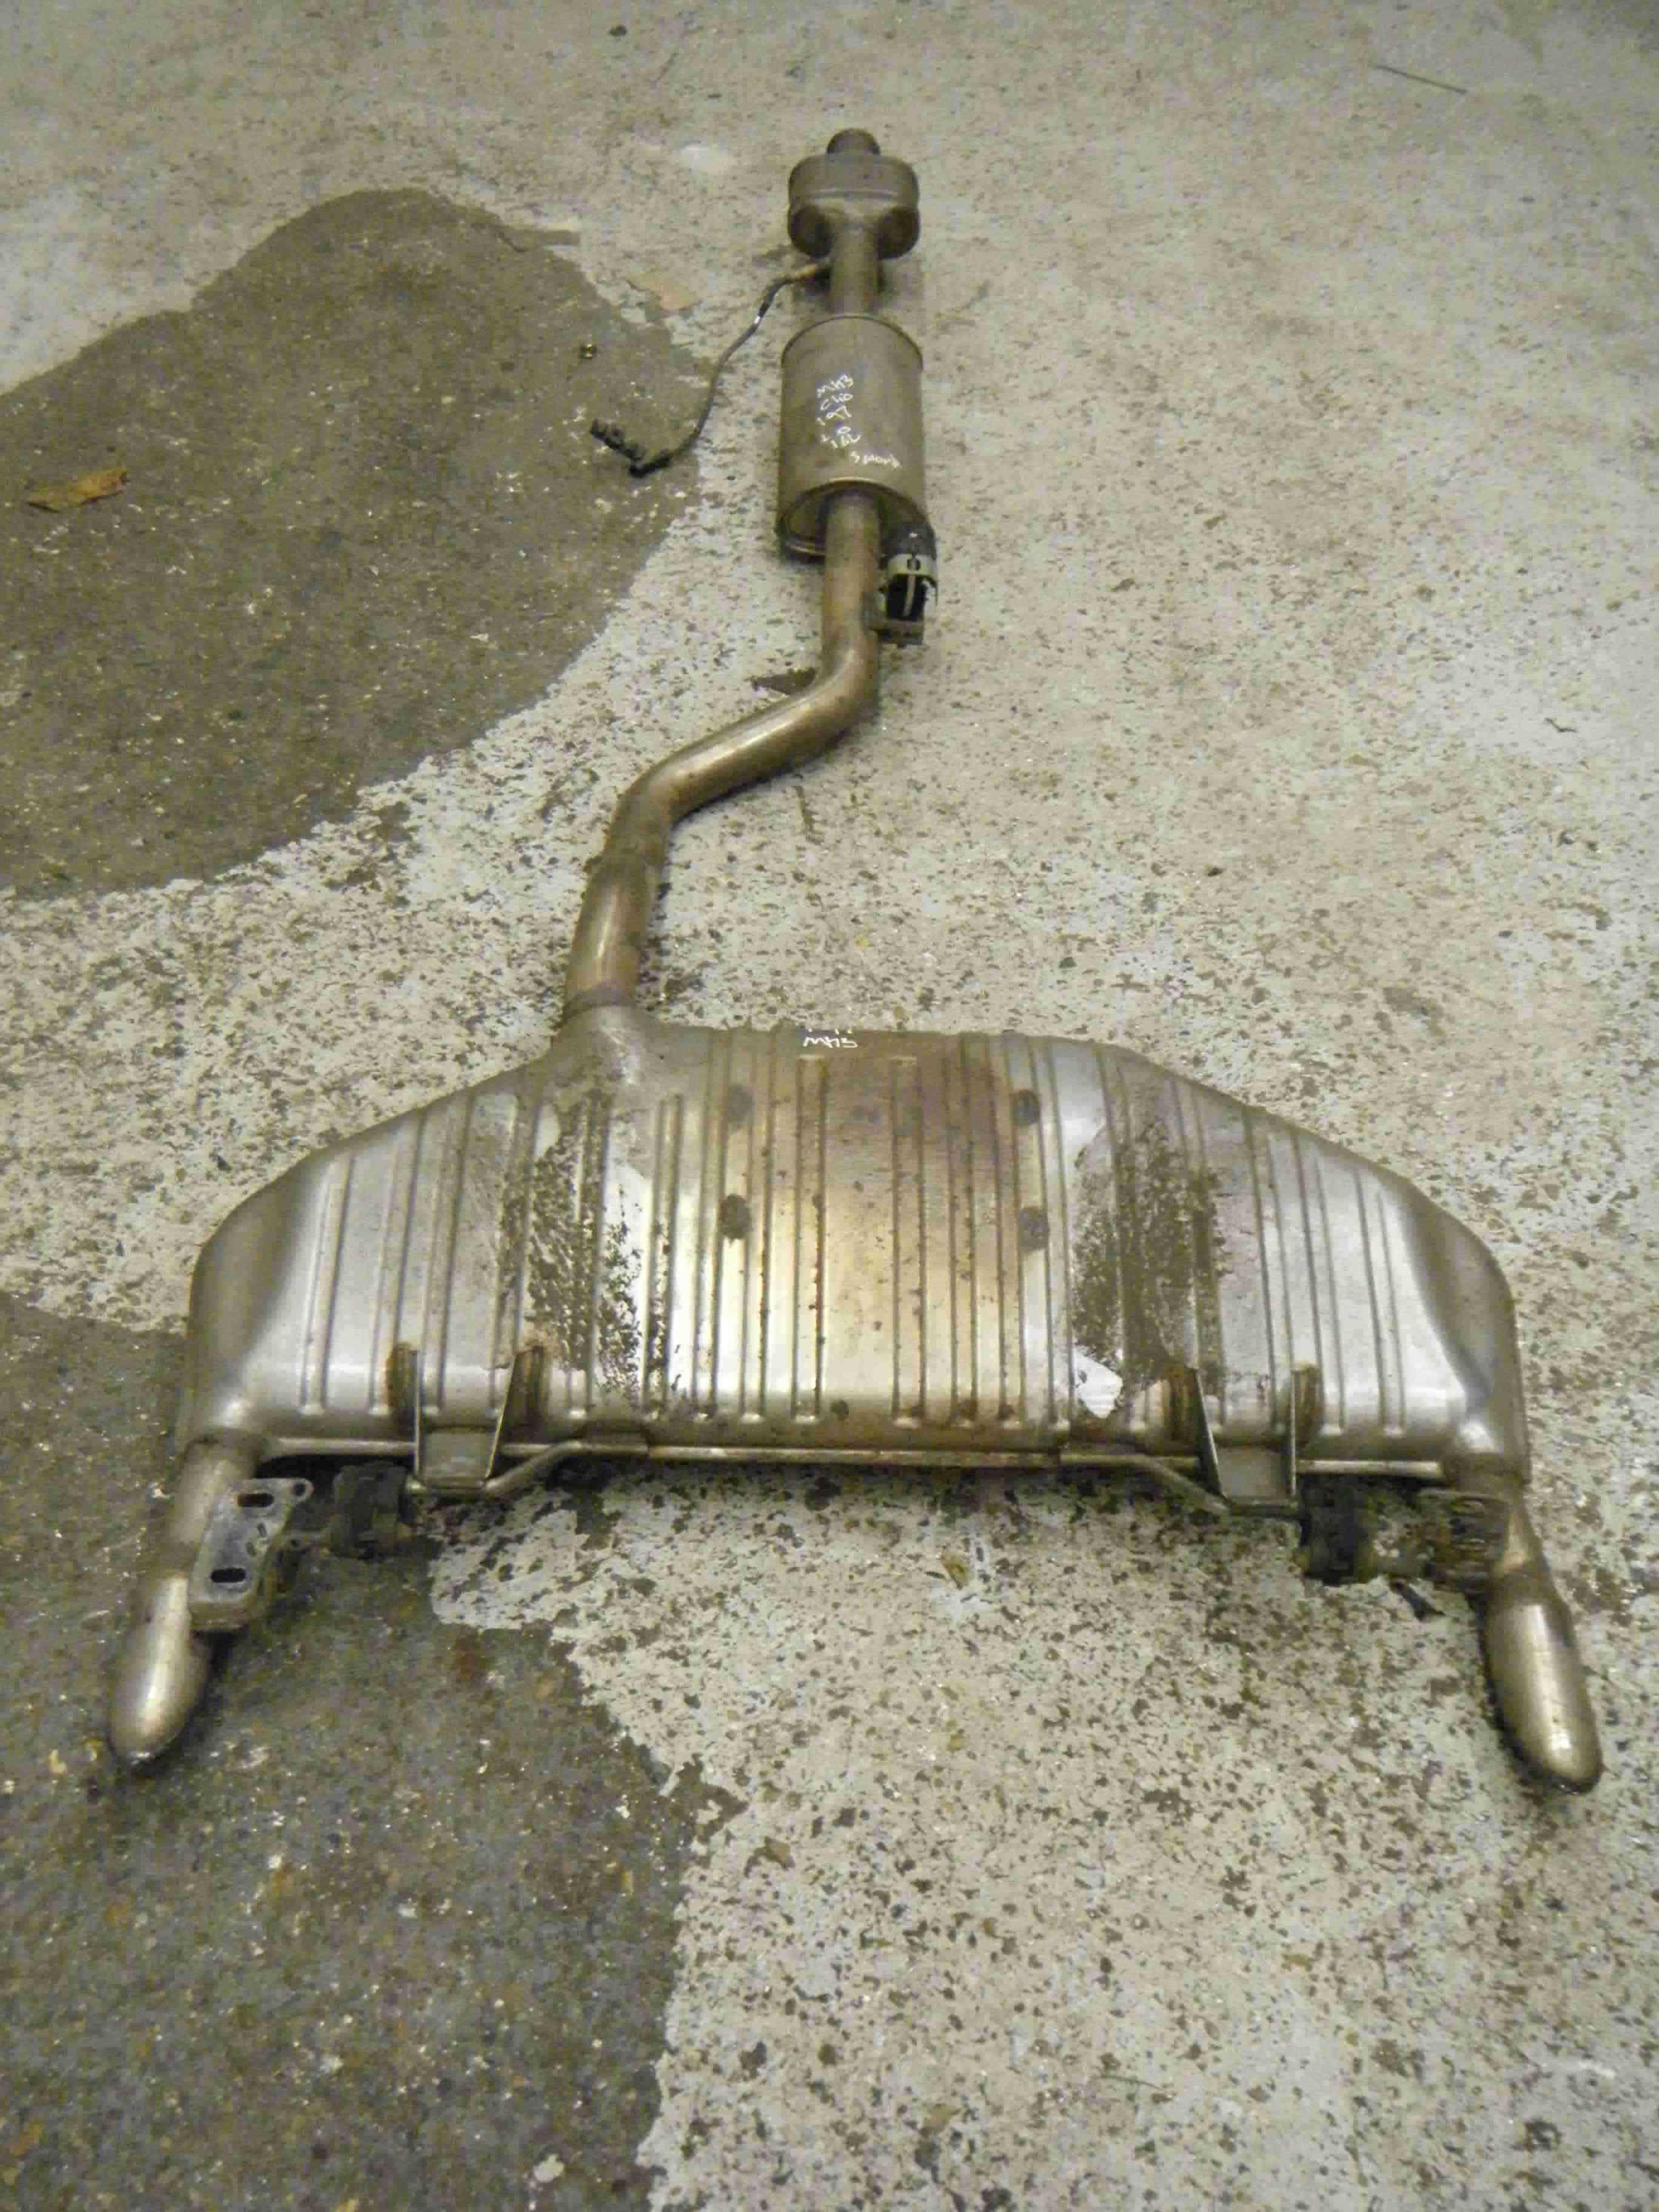 Renault Clio Sport 2005-2012 197 2.0 Exhaust System Backbox Catalytic Converter